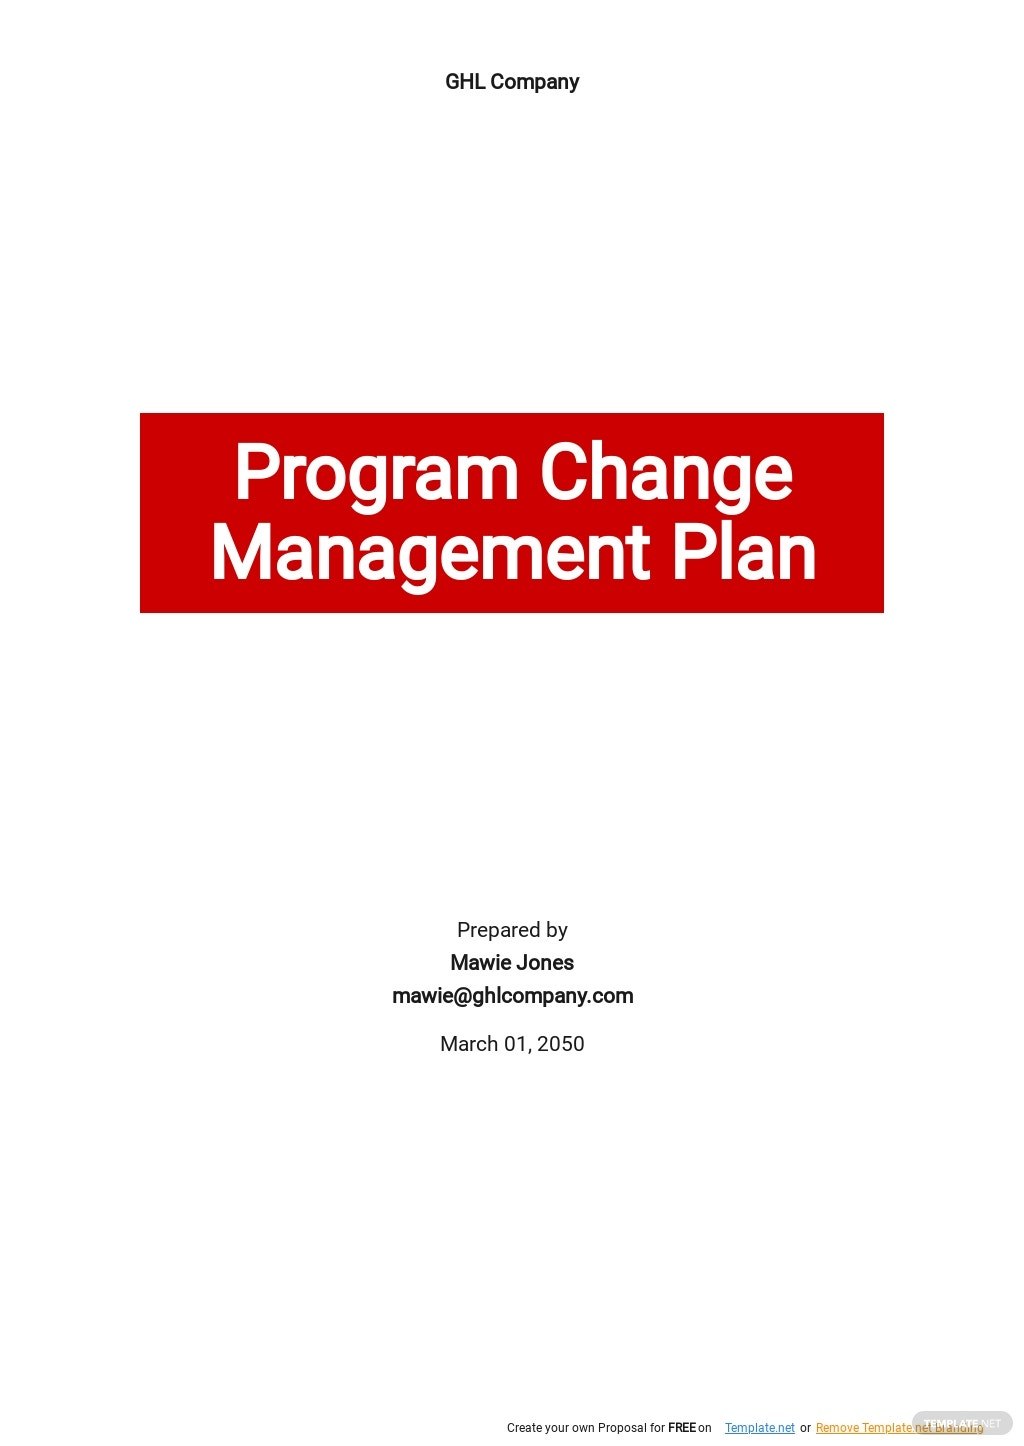 Program Change Management Plan Template.jpe